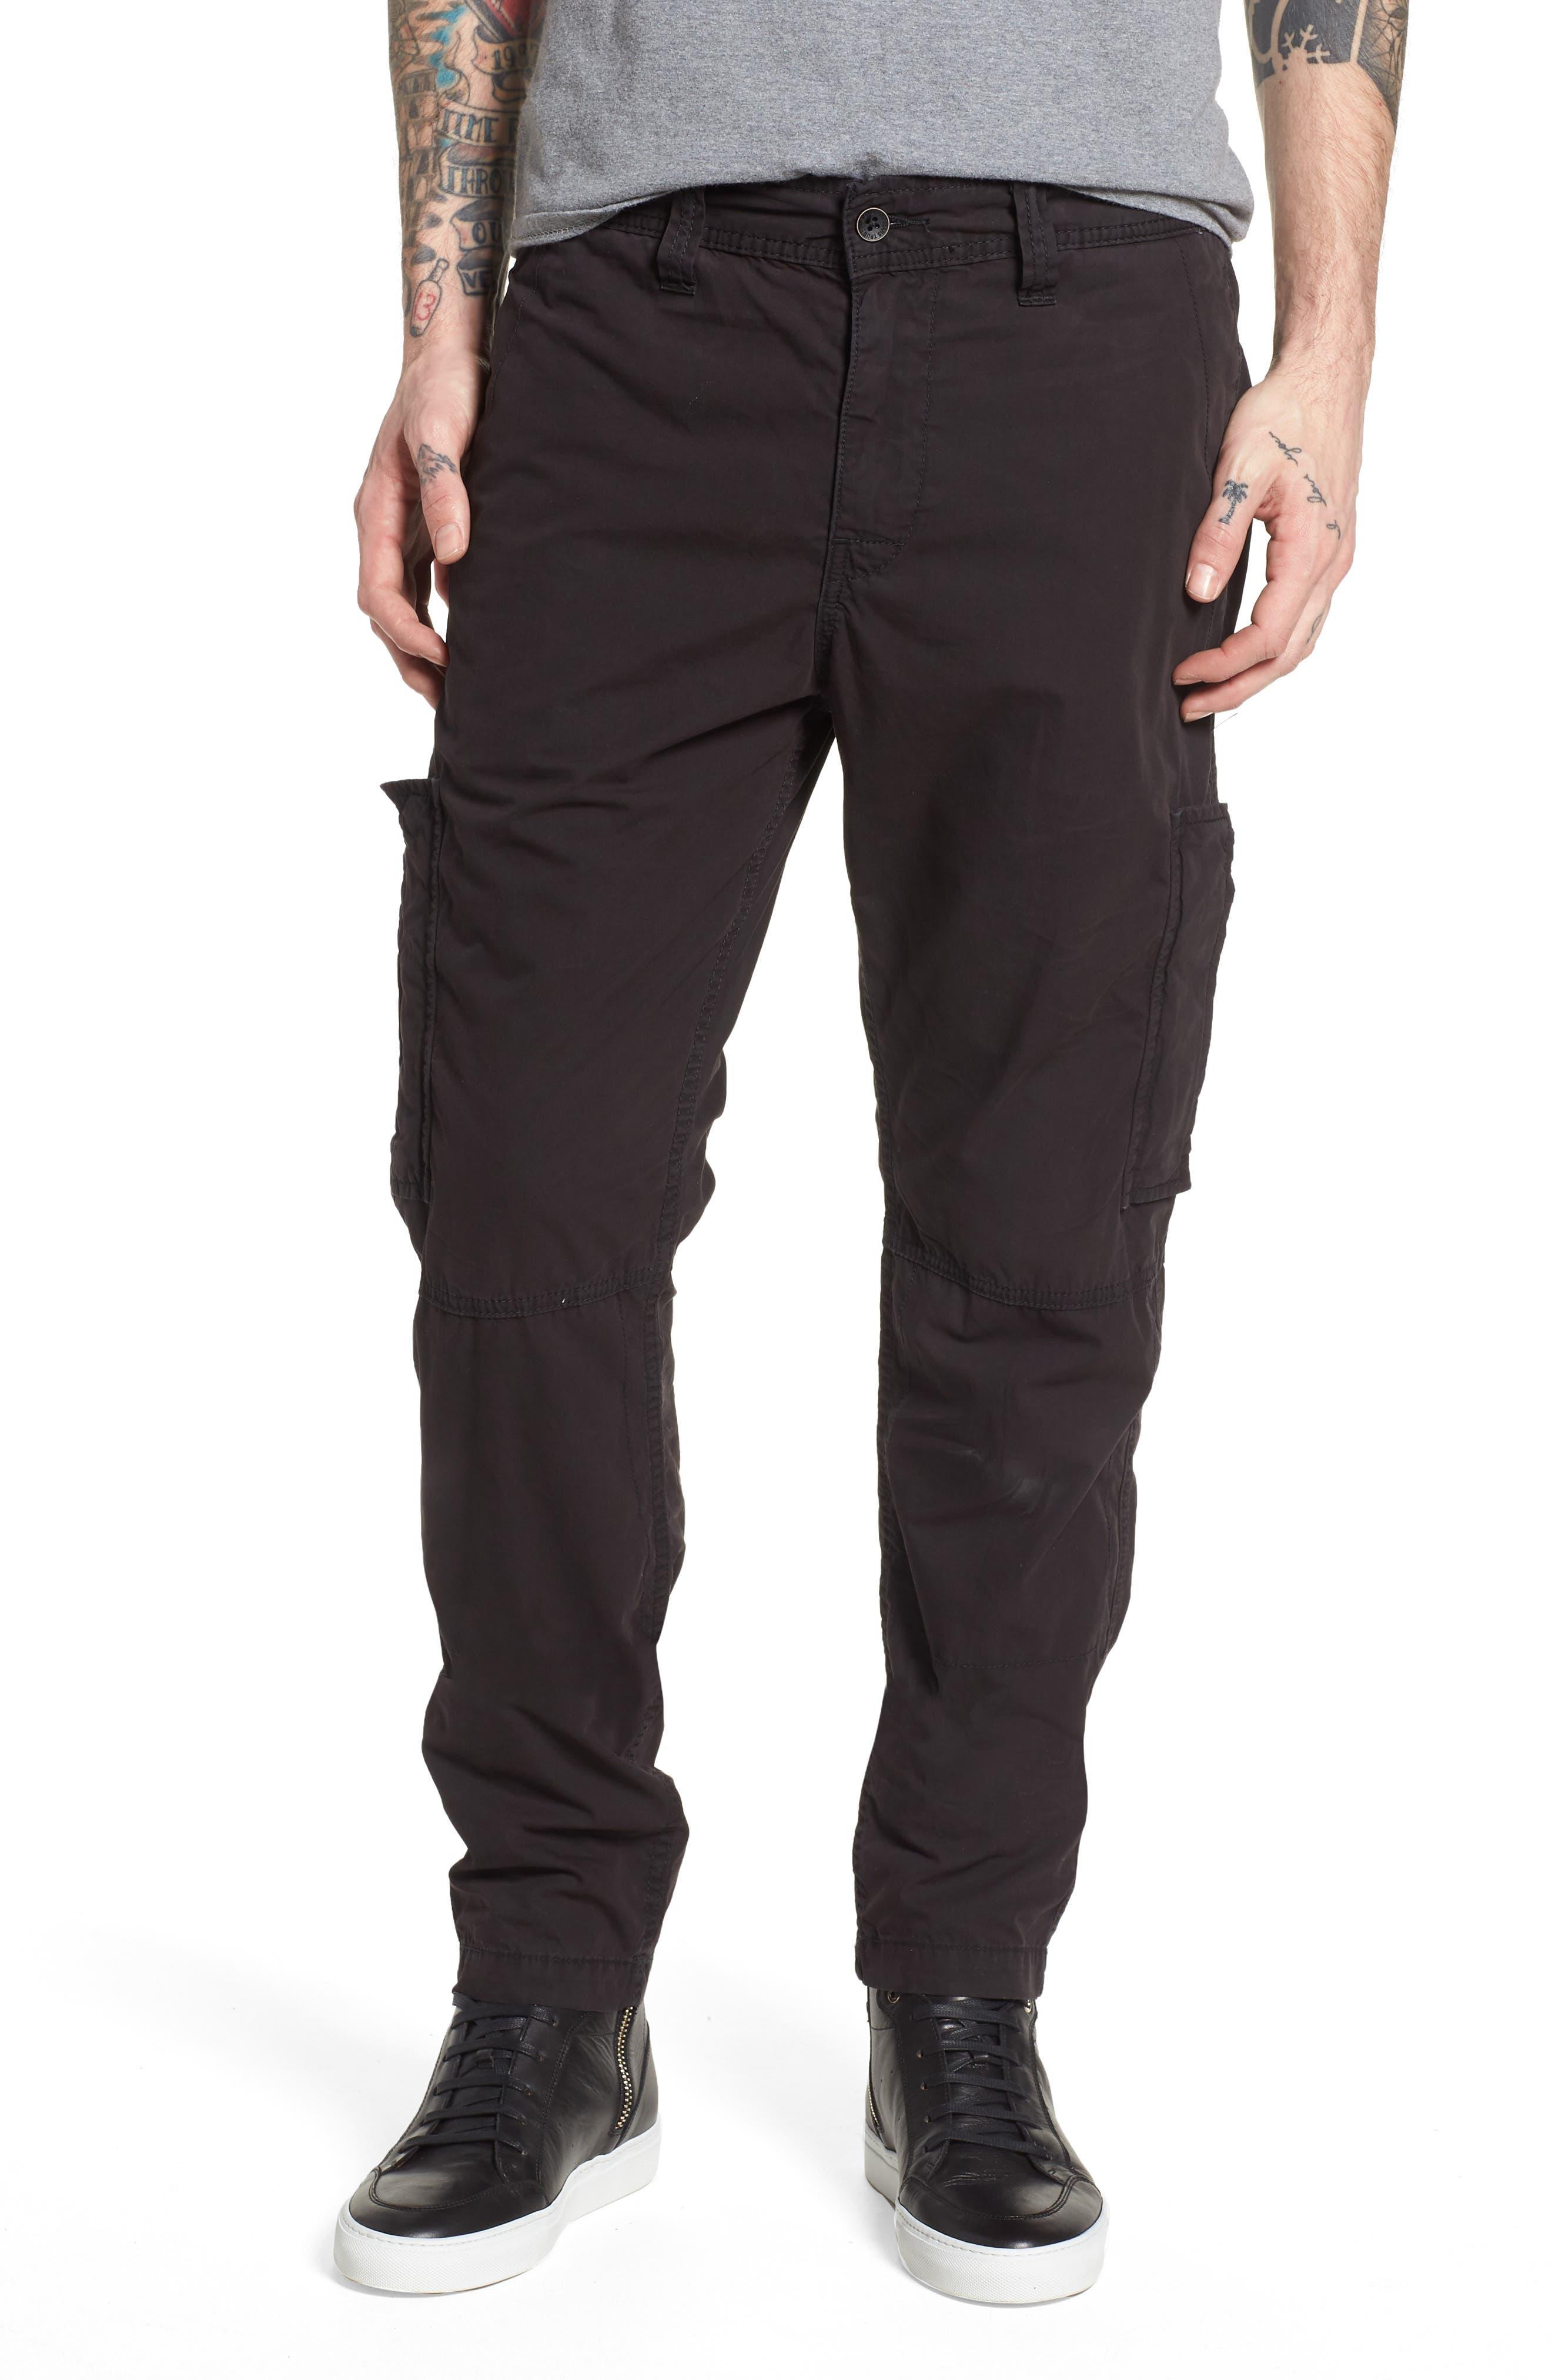 Officer Field Pants,                             Main thumbnail 1, color,                             Black